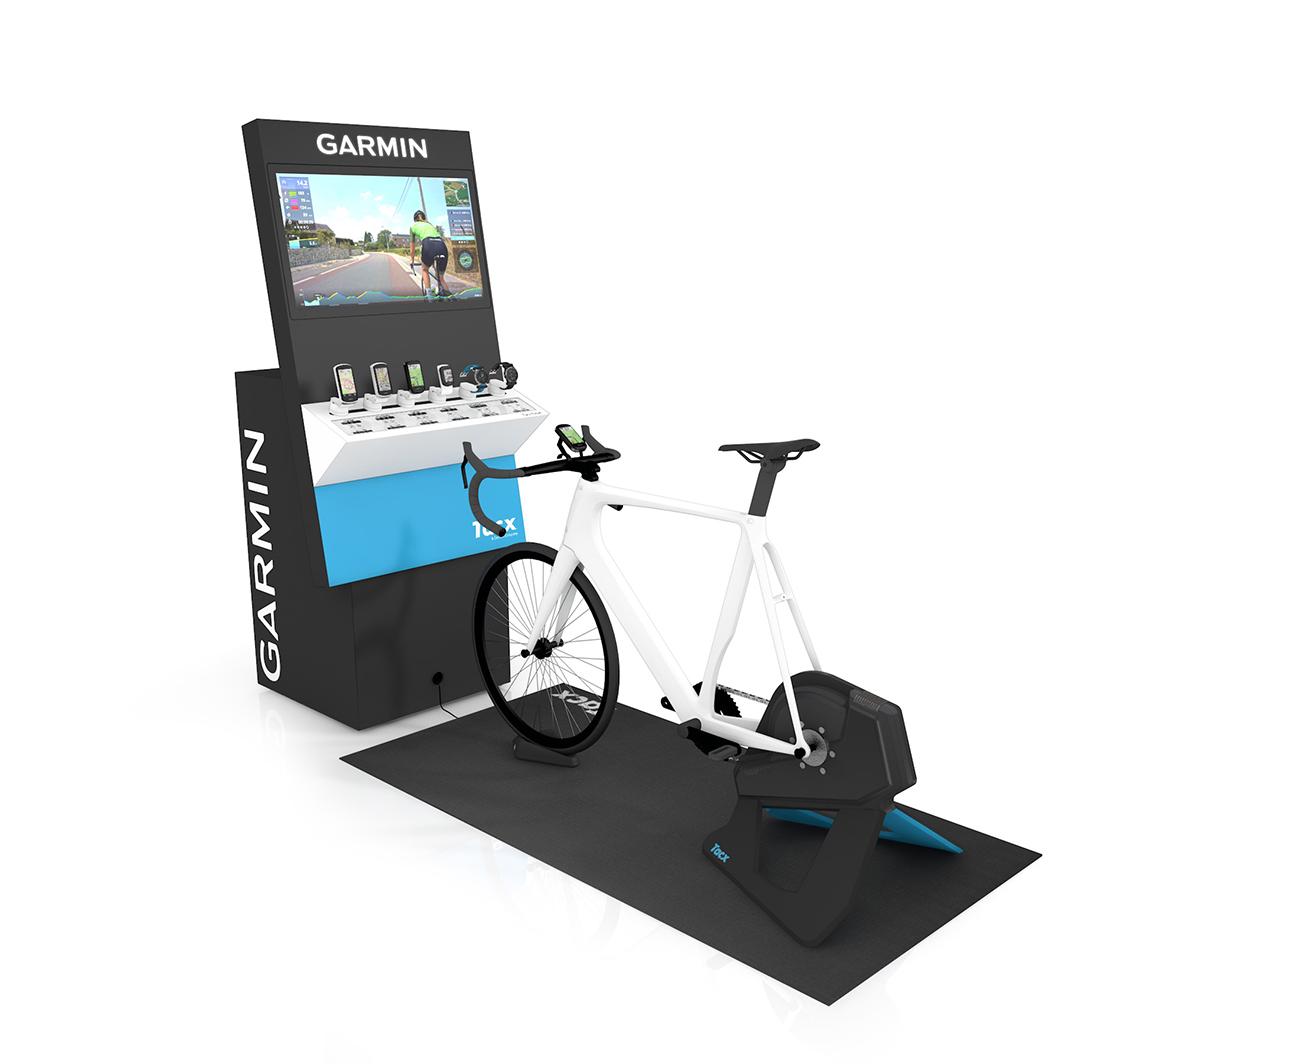 Garmin Global Cycling Display 1300